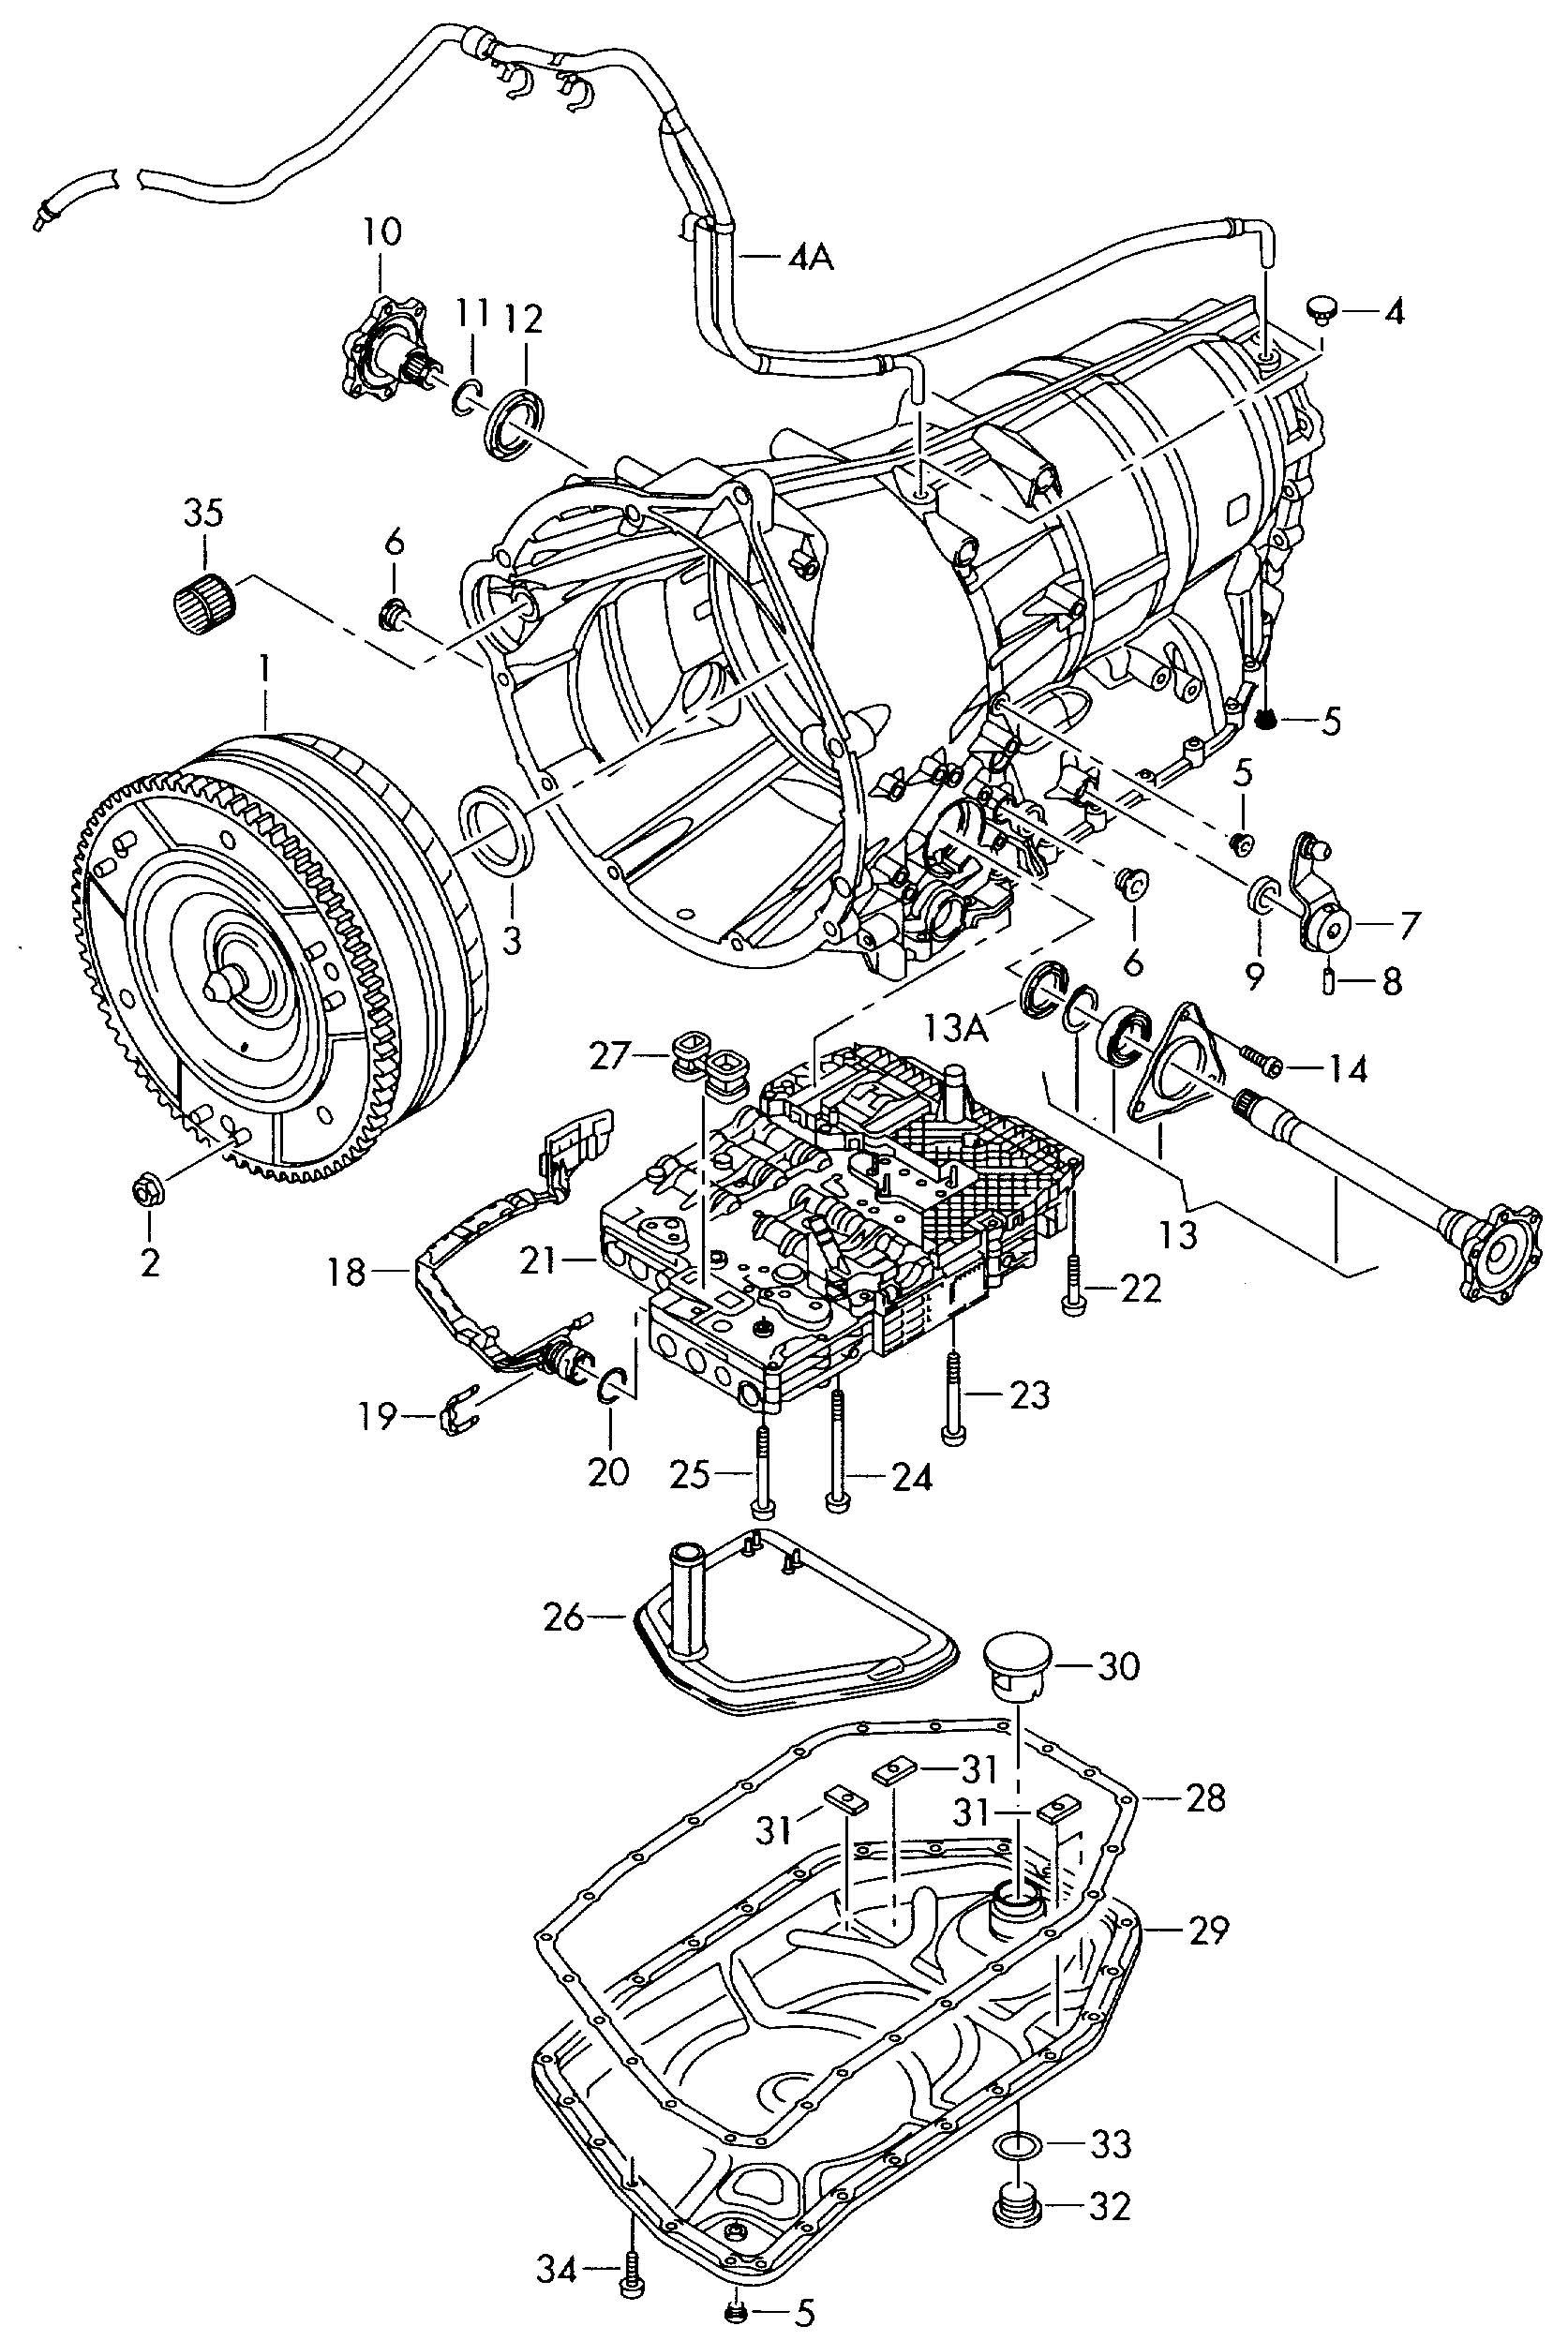 Volkswagen Gasket For Oil Pan Gasket For Oil Sump